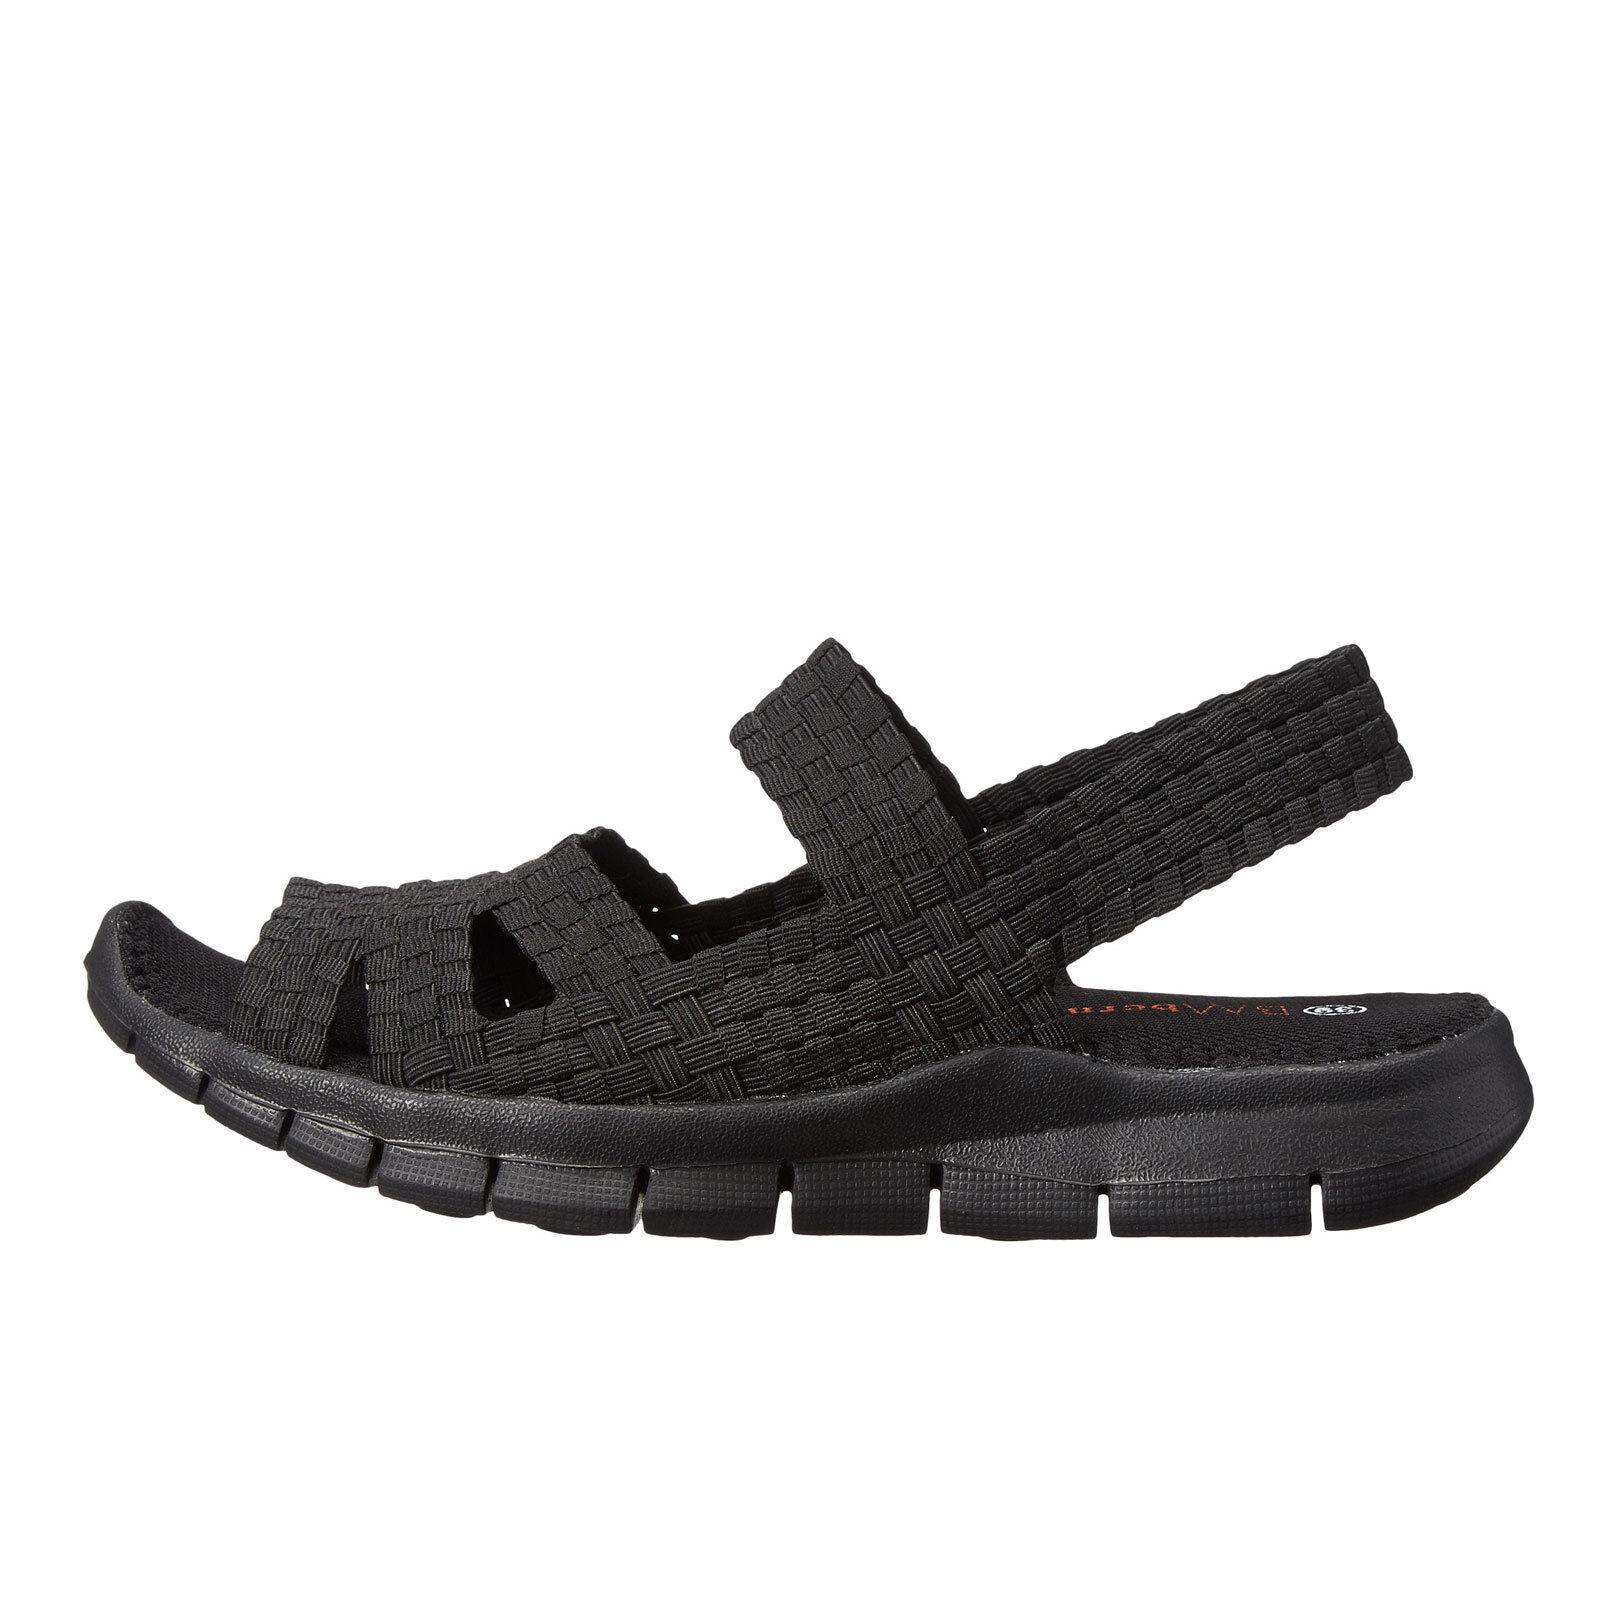 Bernie Mev. Cindy Black  Women's Casual Woven Slingback Sandals